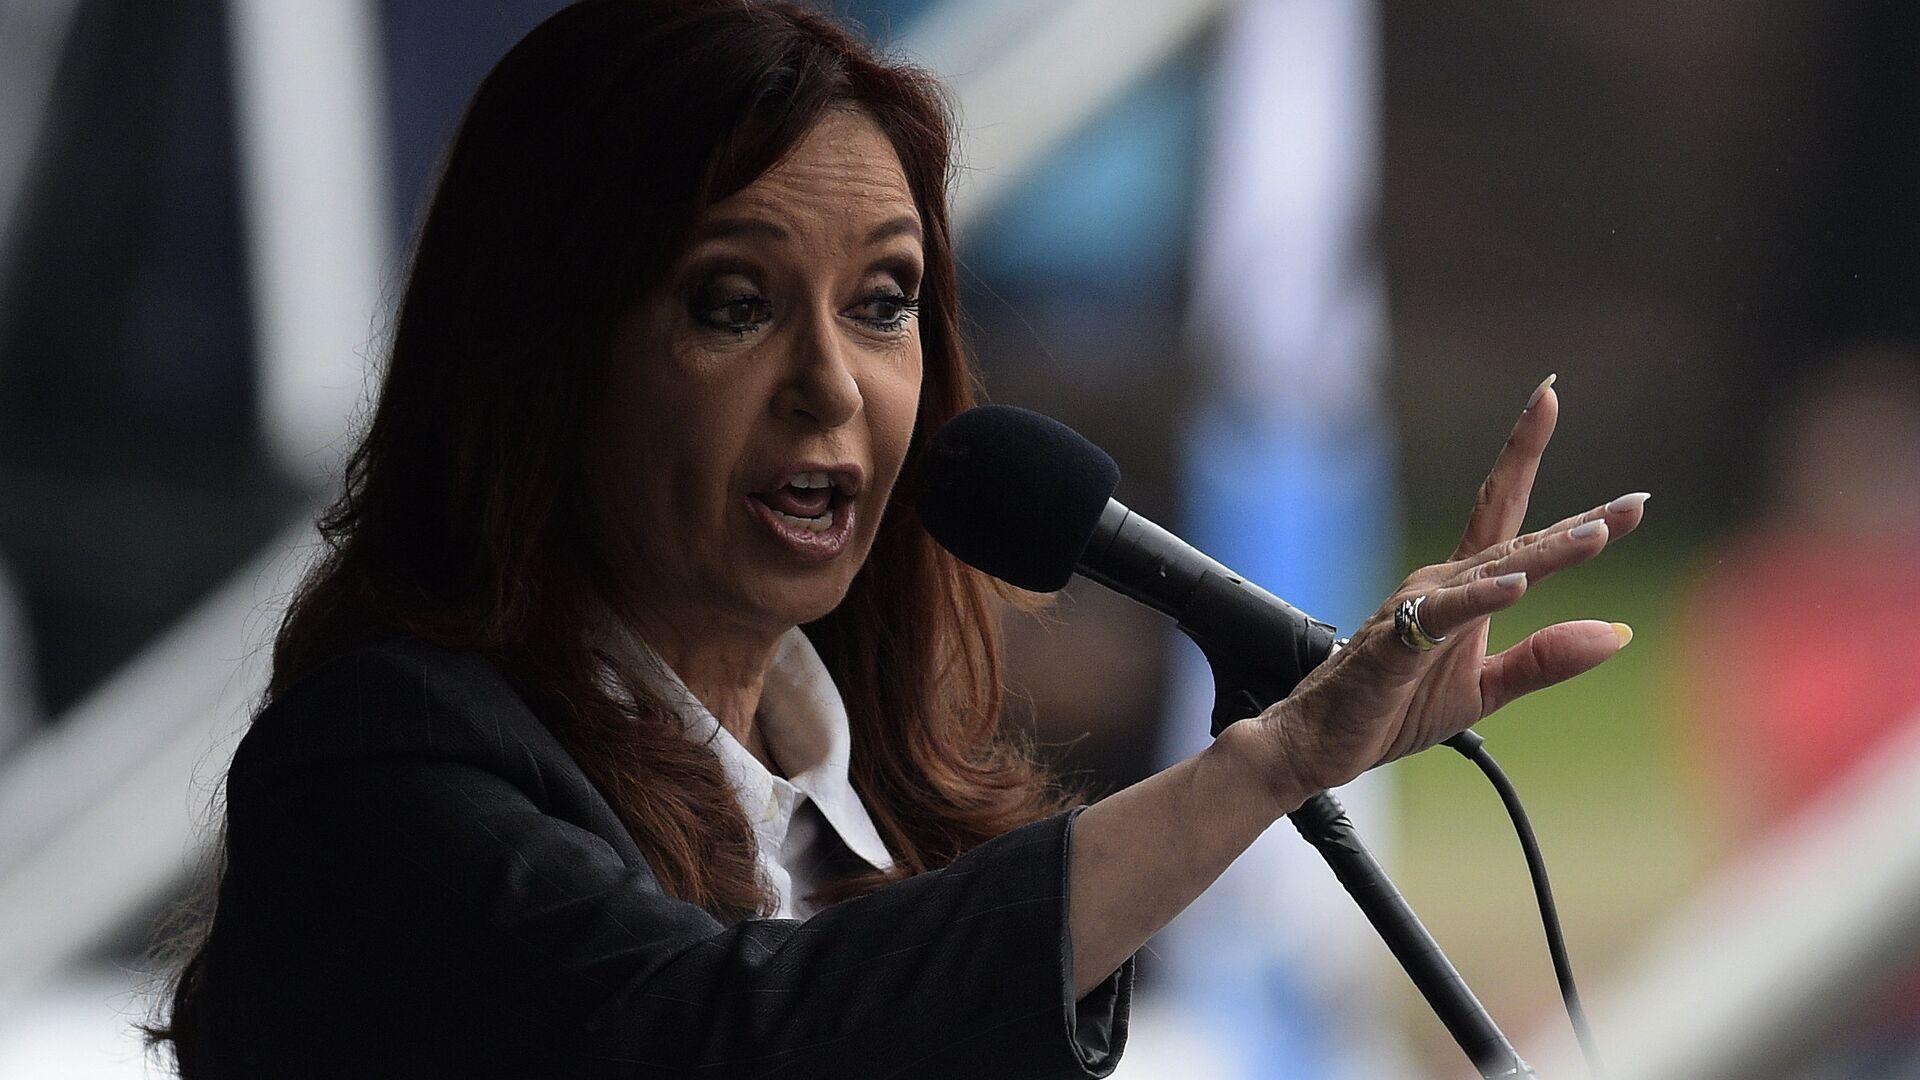 Cristina Fernández de Kirchner, expresidenta de Argentina - Sputnik Mundo, 1920, 16.07.2021